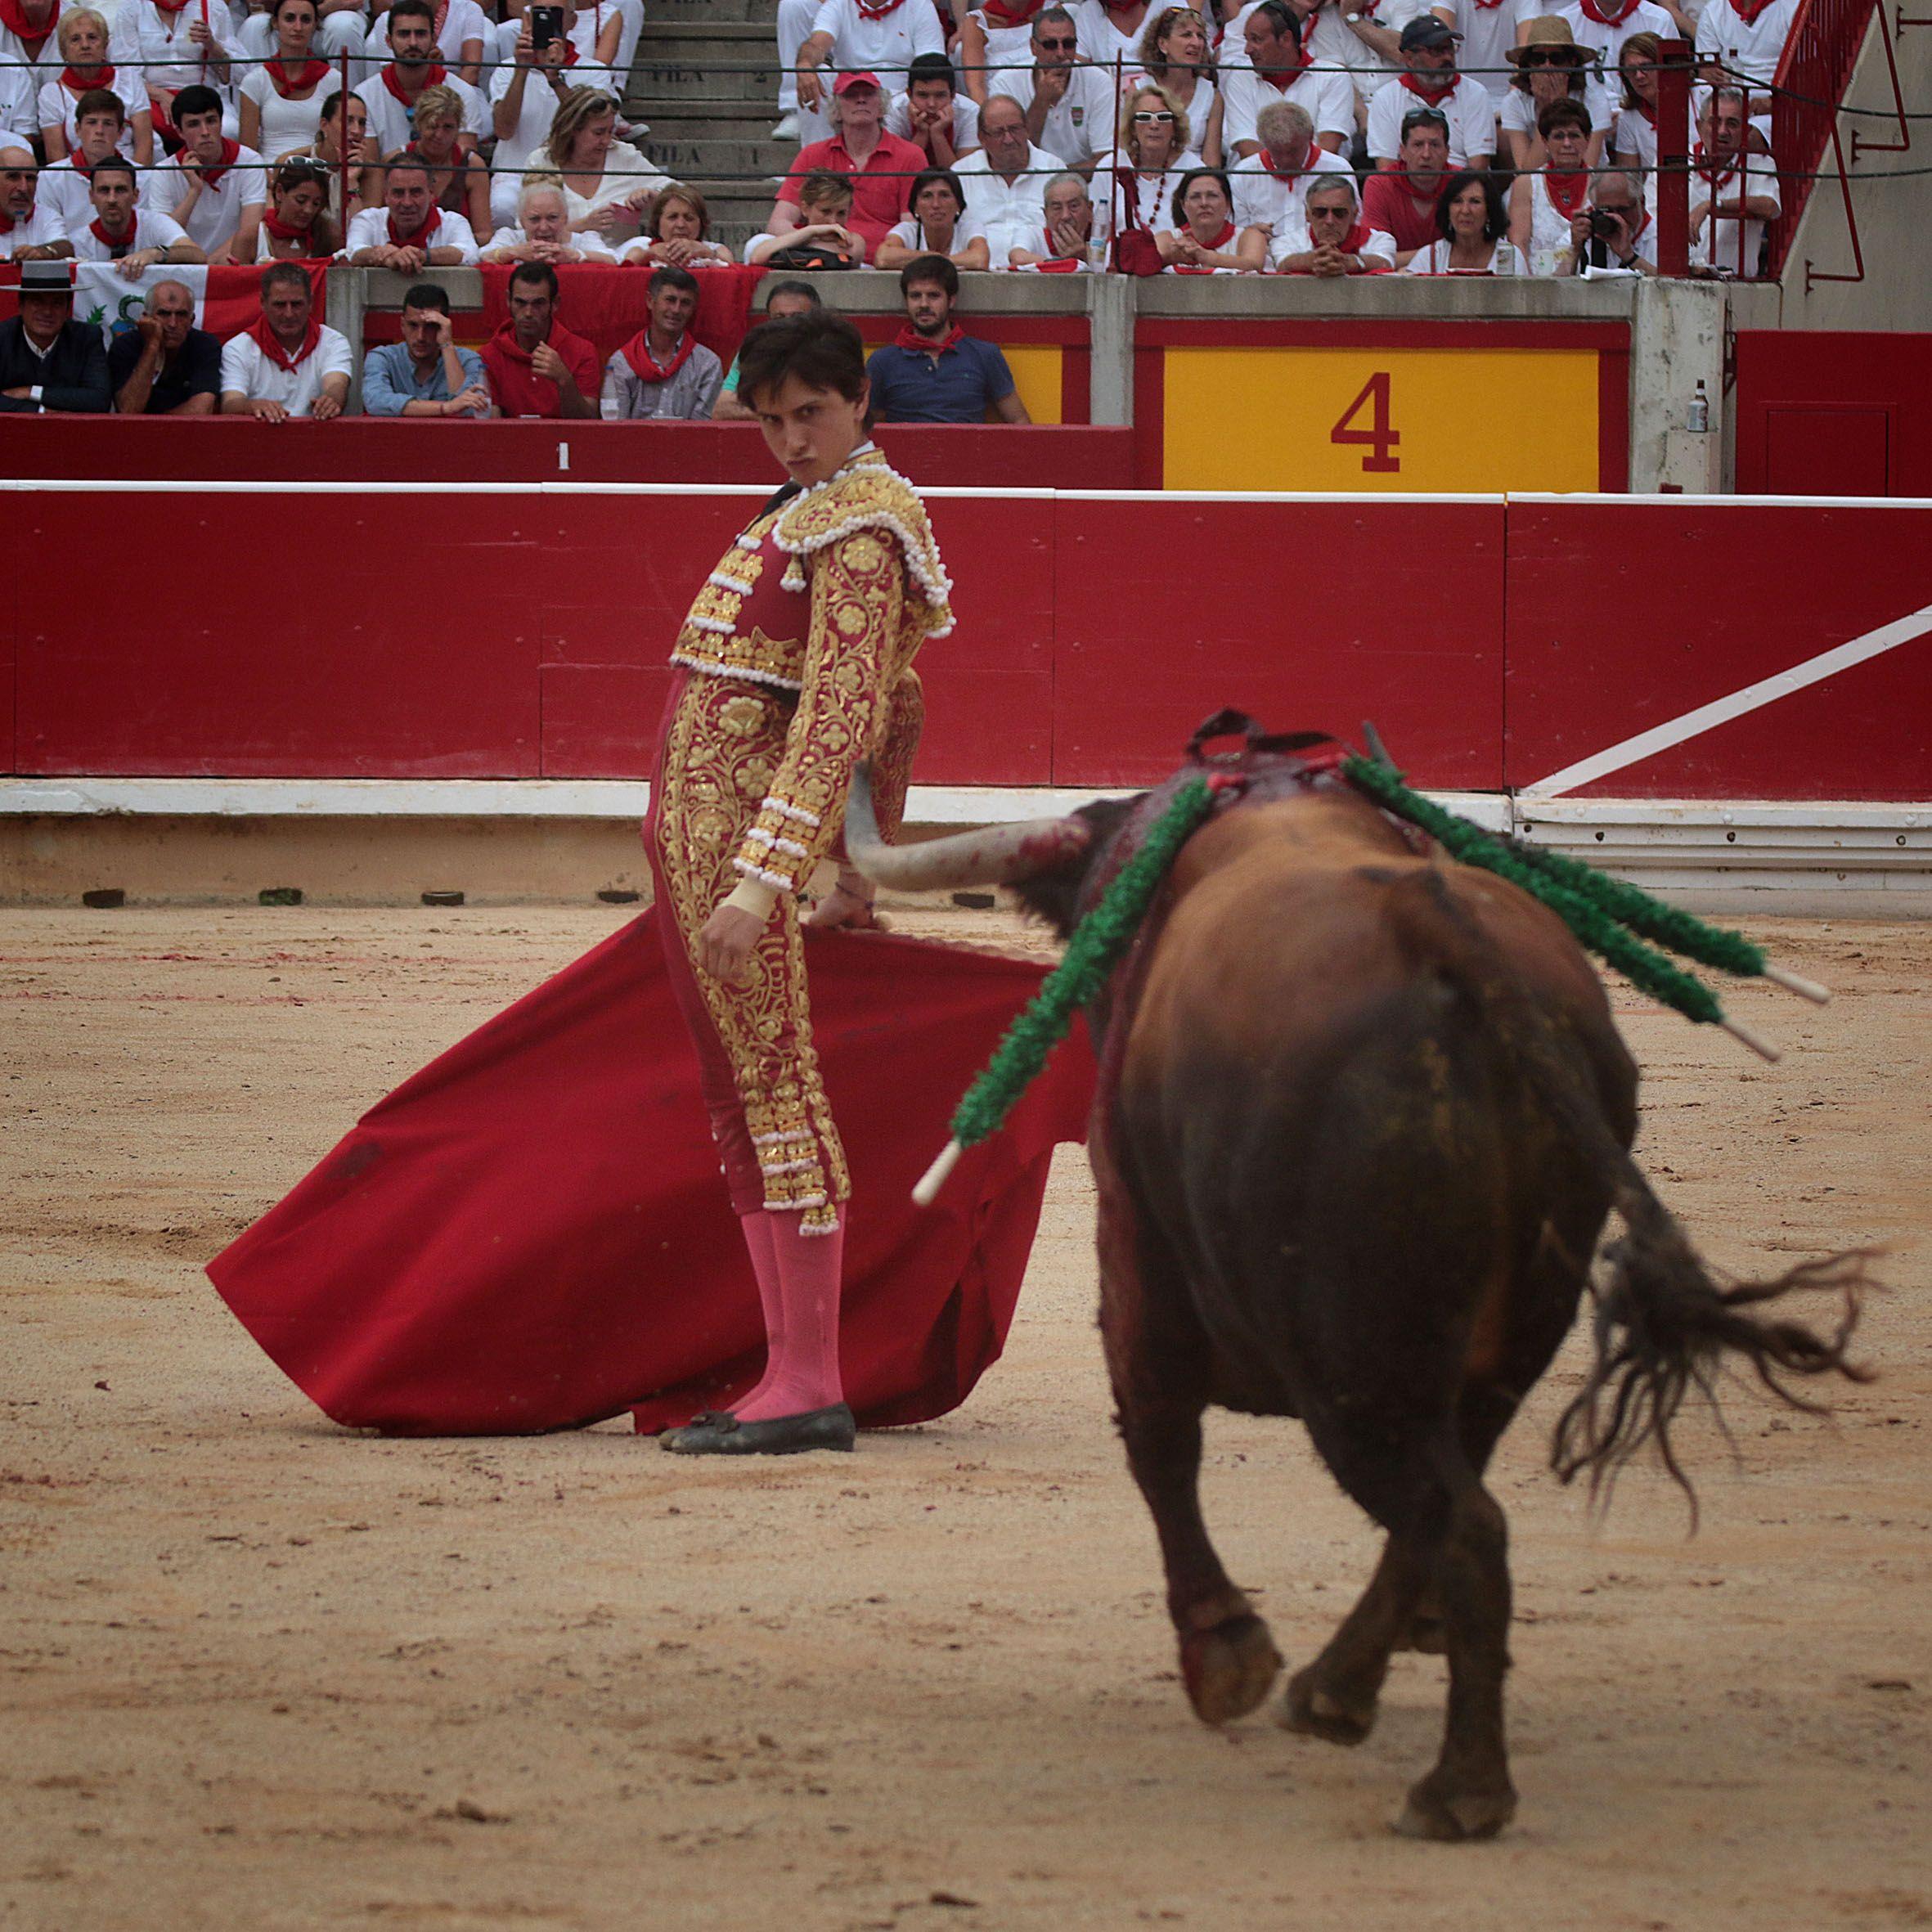 Pamplona 07.07.2016 | Crónica fotográfica de Maurice Berho| Pamplona 07.07.2016 | Crónica fotográfica de Maurice Berho